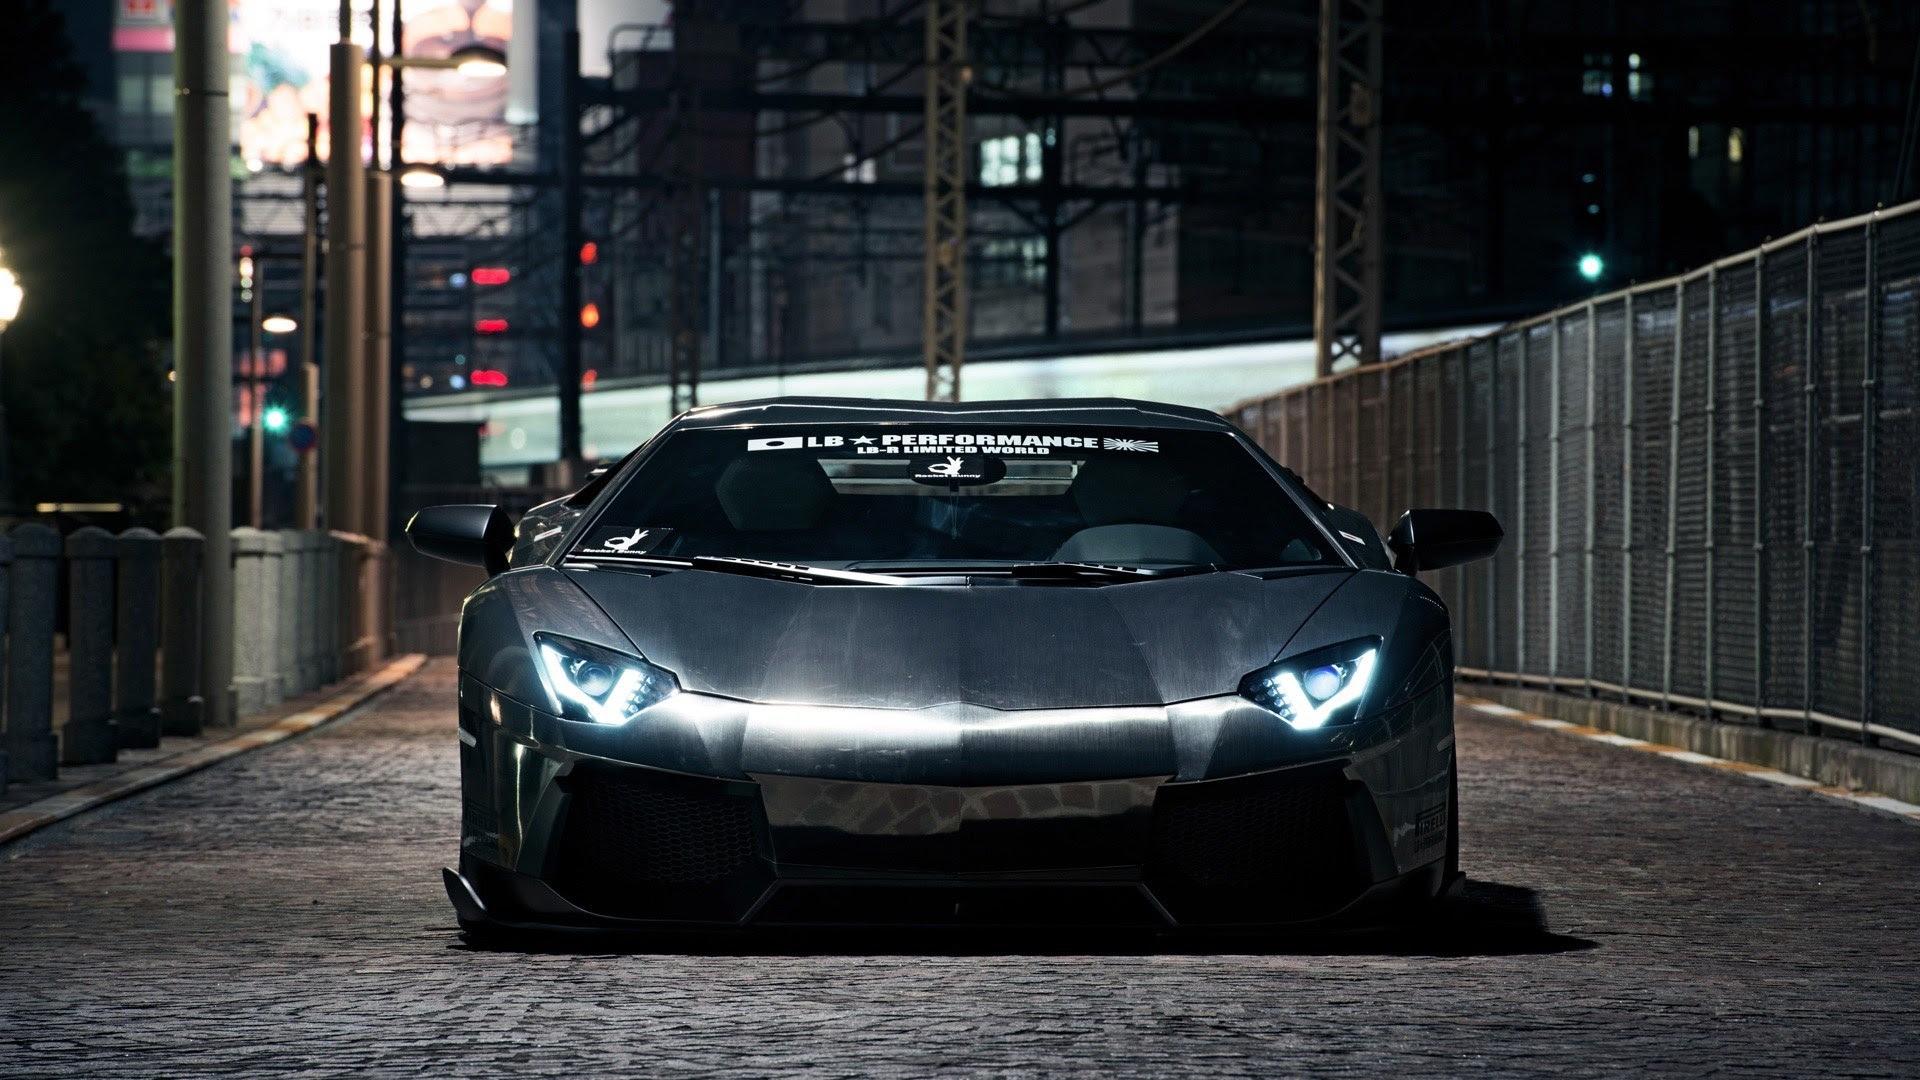 City Street Lamborghini Aventador Lp700 4 Wallpaper 1920x1080